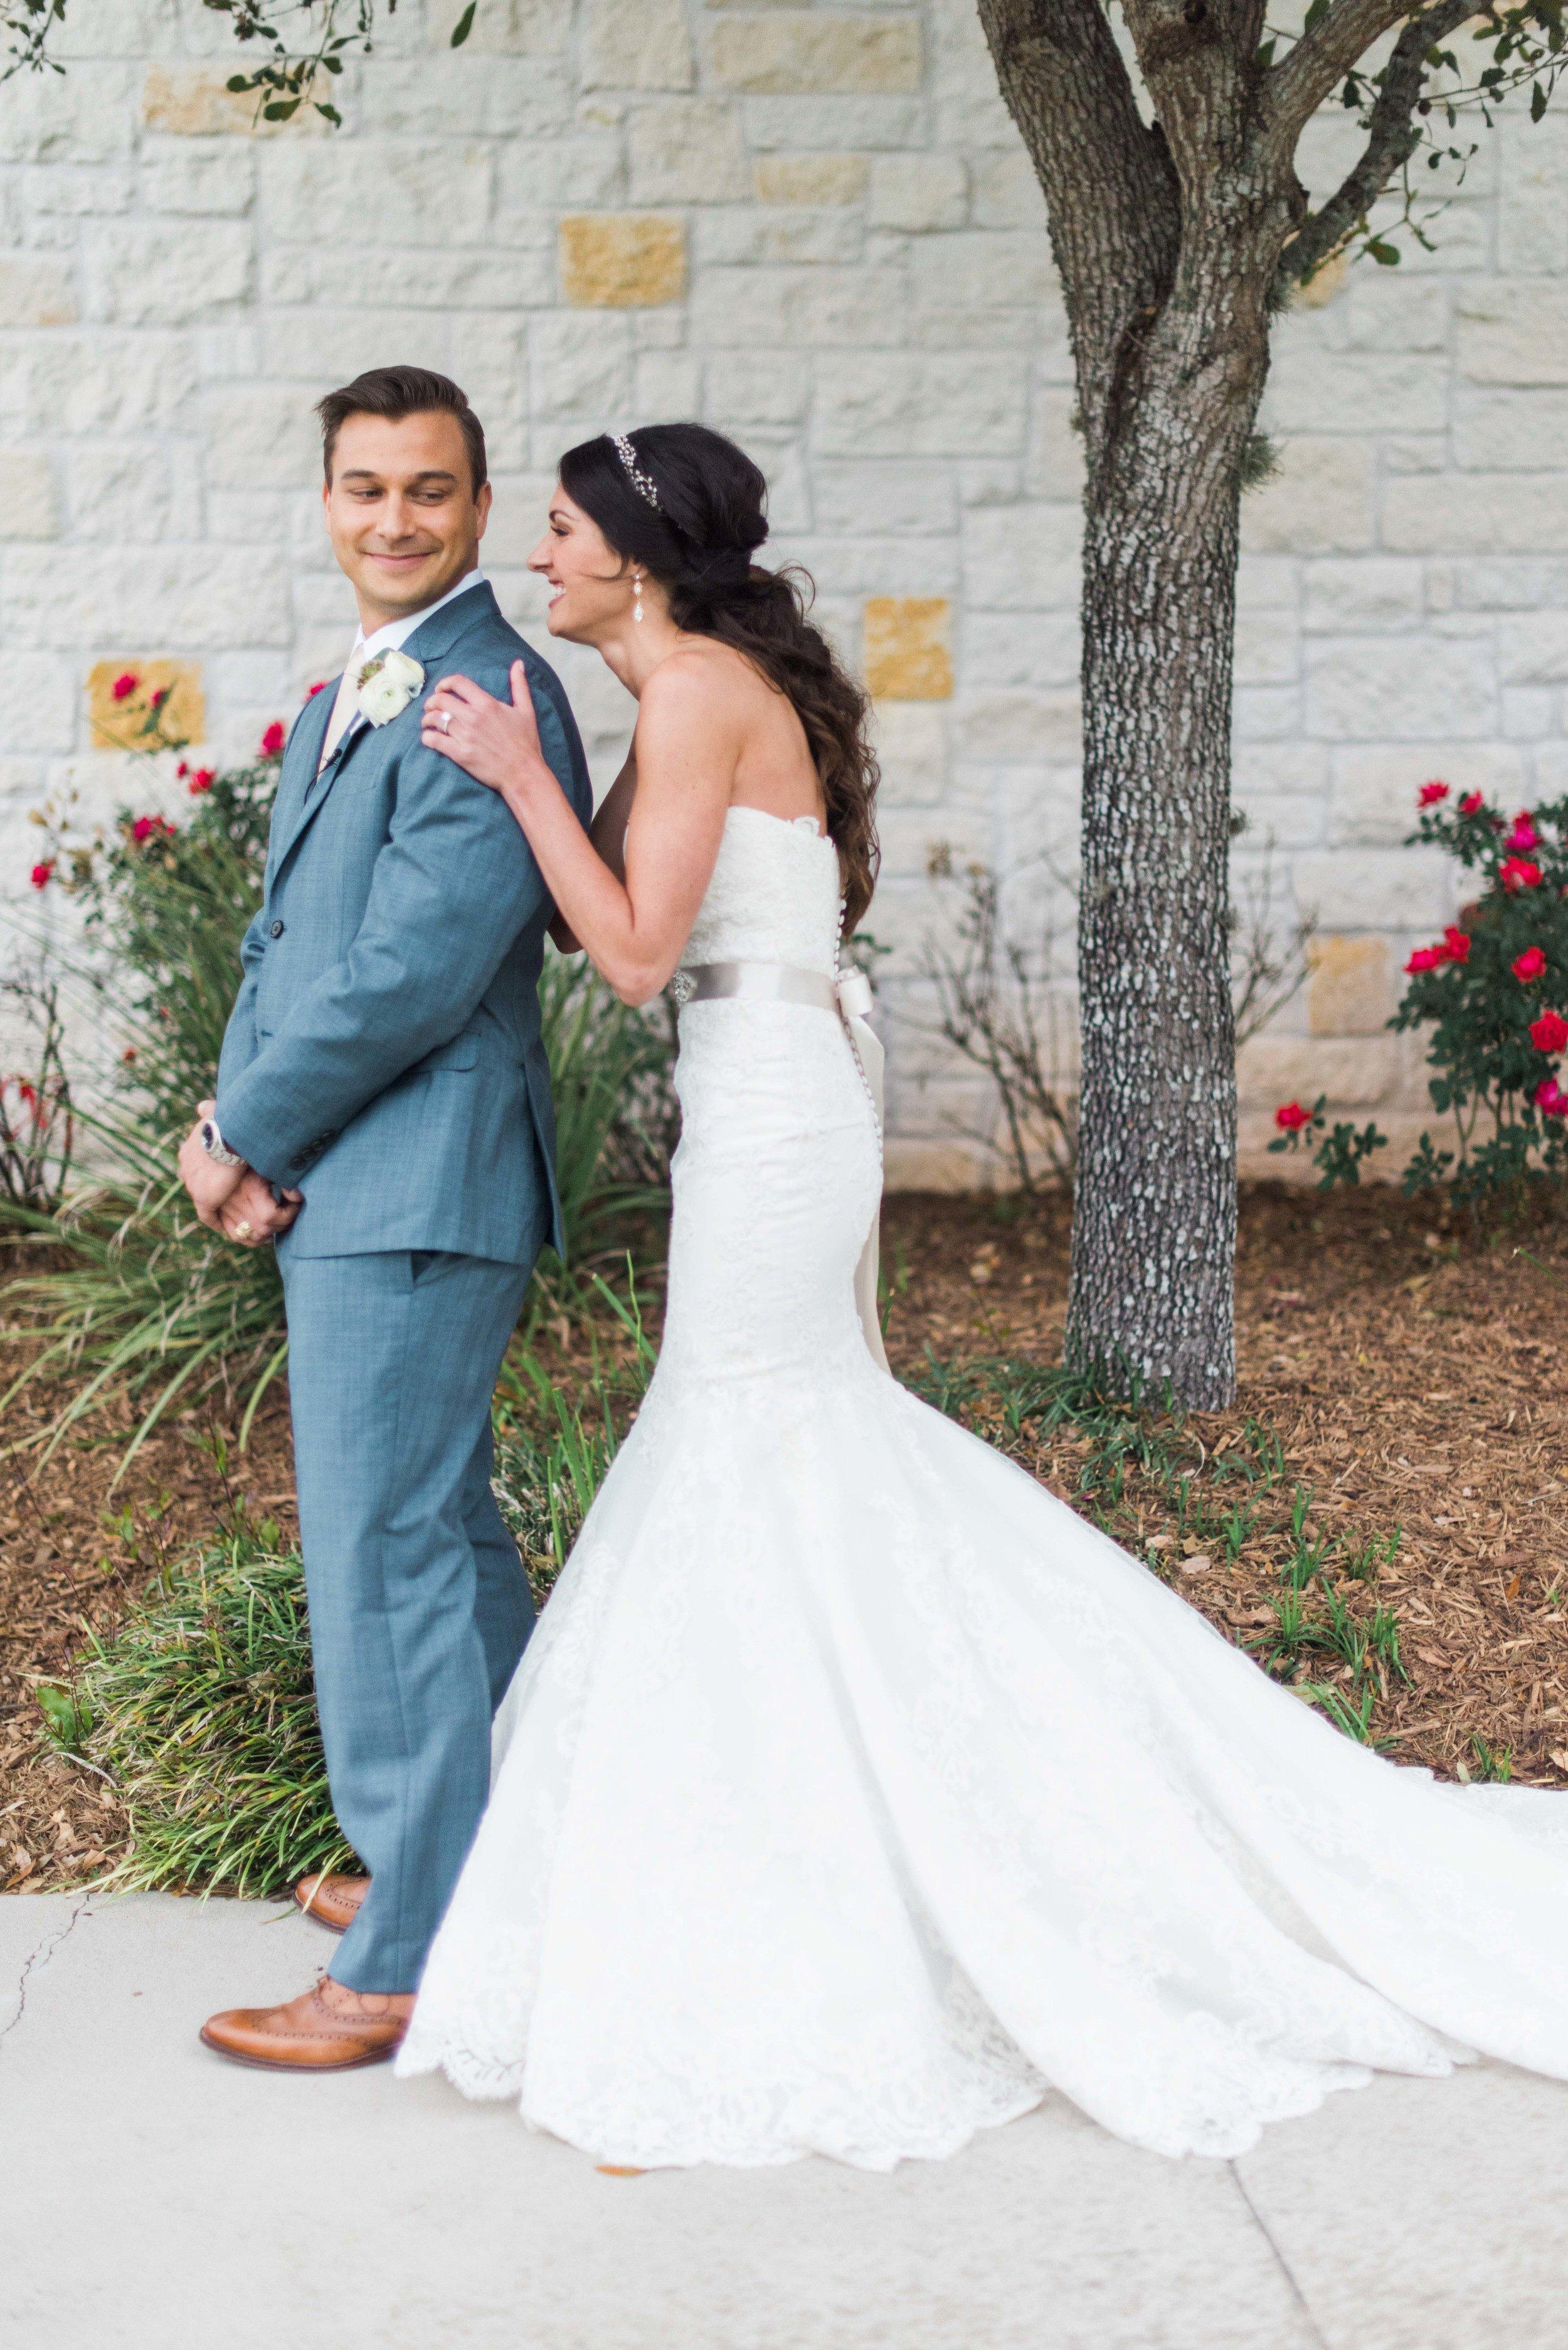 Briscoe-Manor-Houston-Wedding-Photographer-Modern-Luxury-Weddings-Dana-Fernandez-Photograpy-Fine-Art-Photographer-Houston-Film-Destination-PNW-Wedding-Photographer-23.jpg